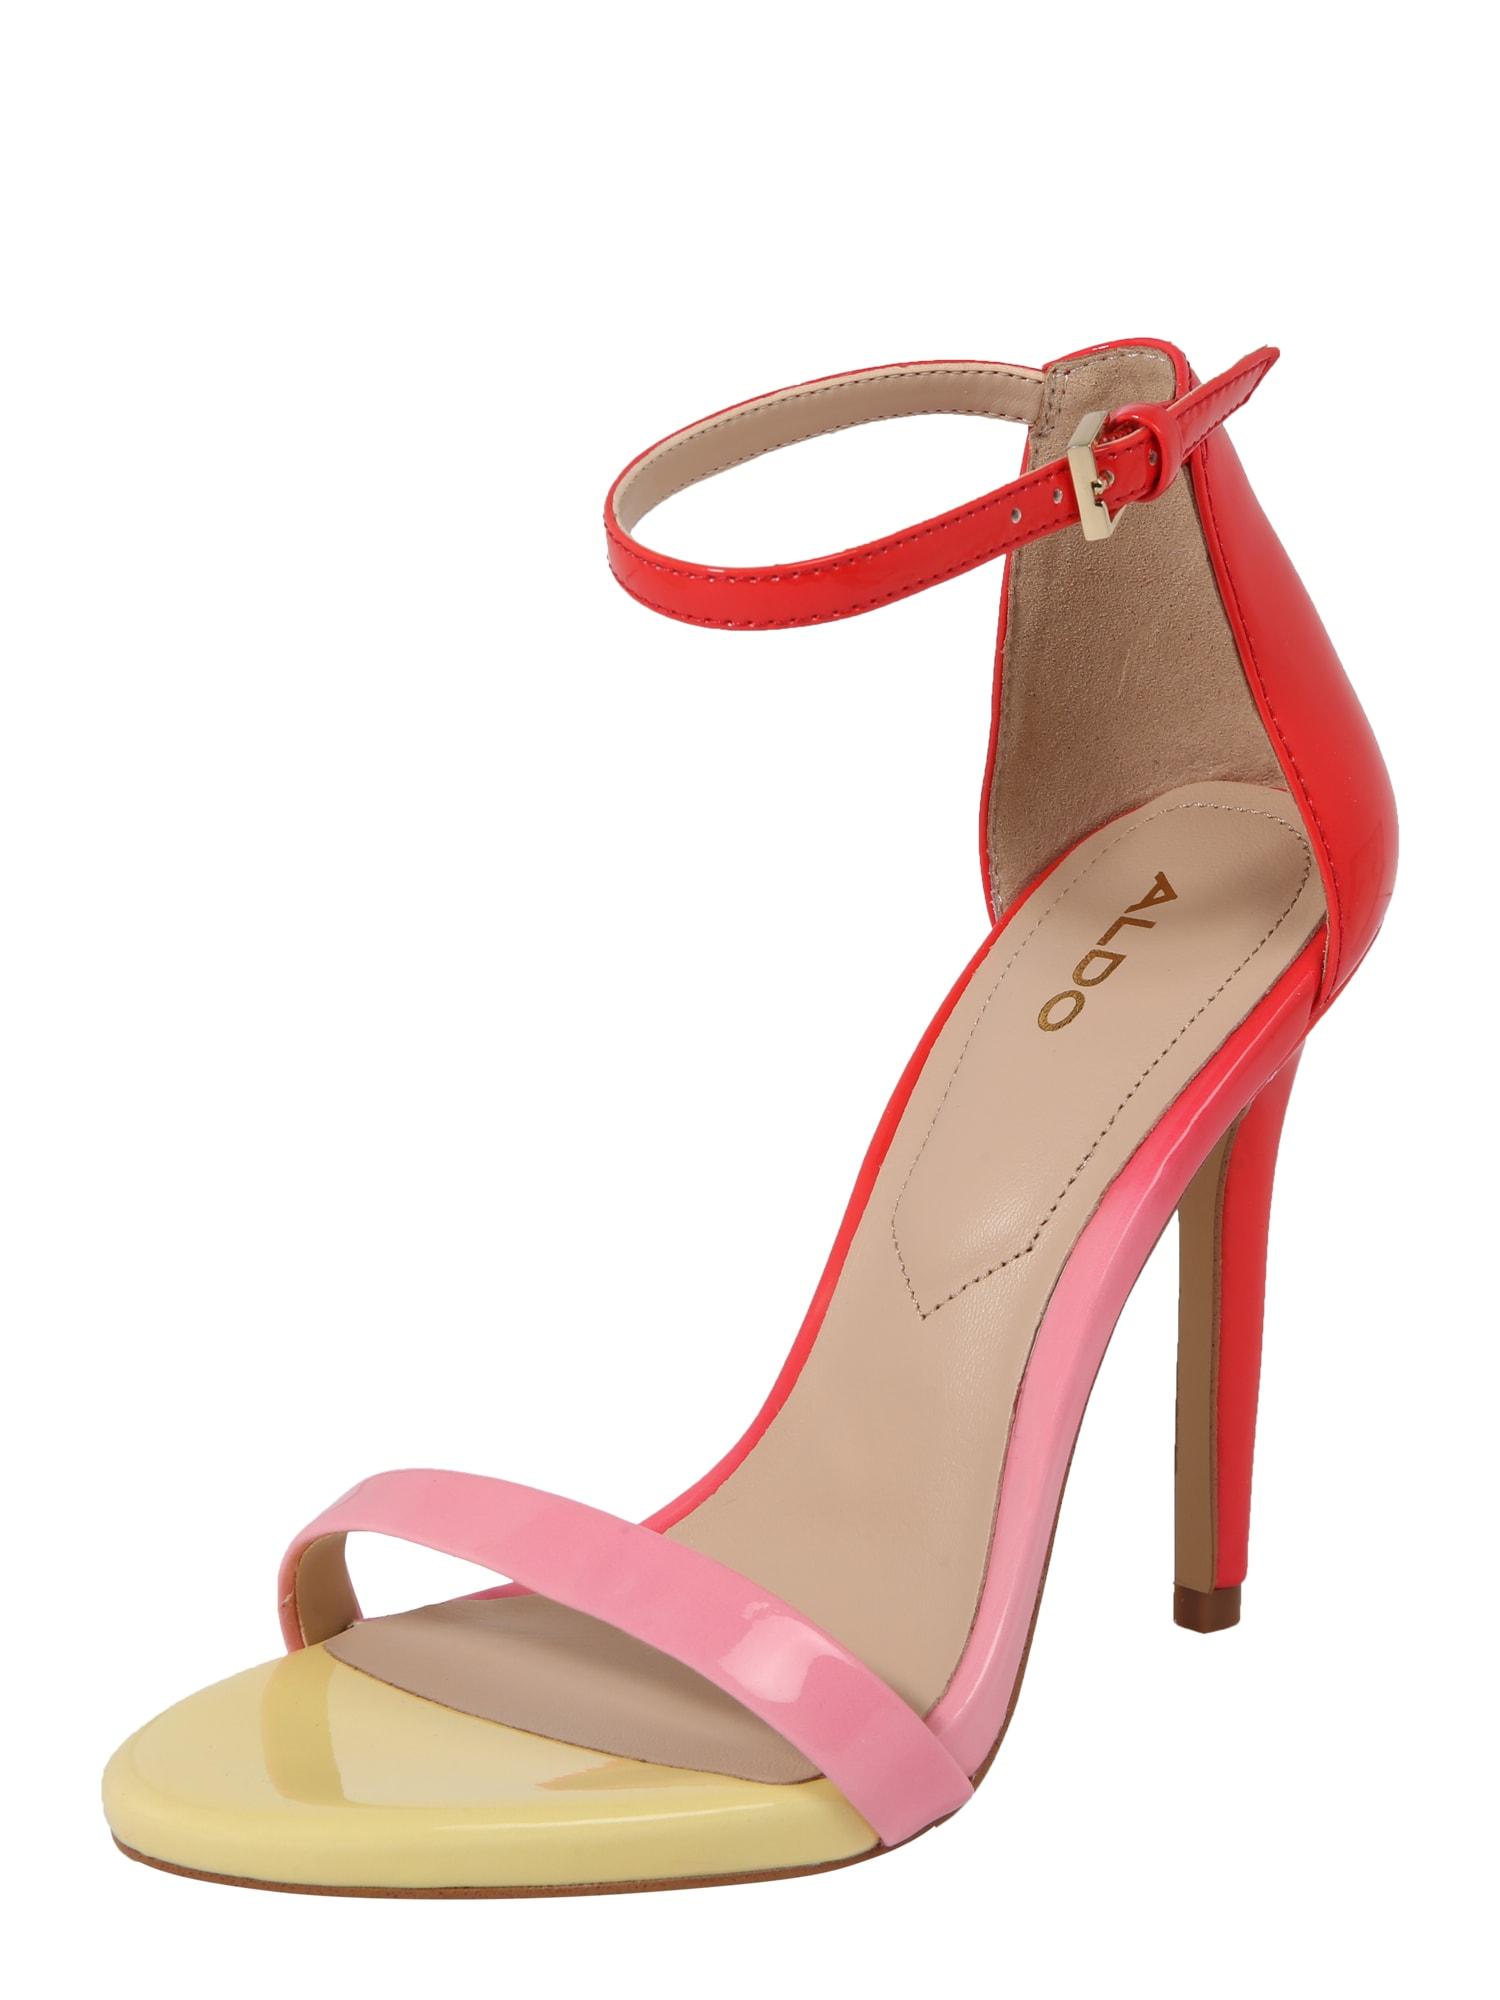 Páskové sandály CARAA žlutá pink červená ALDO